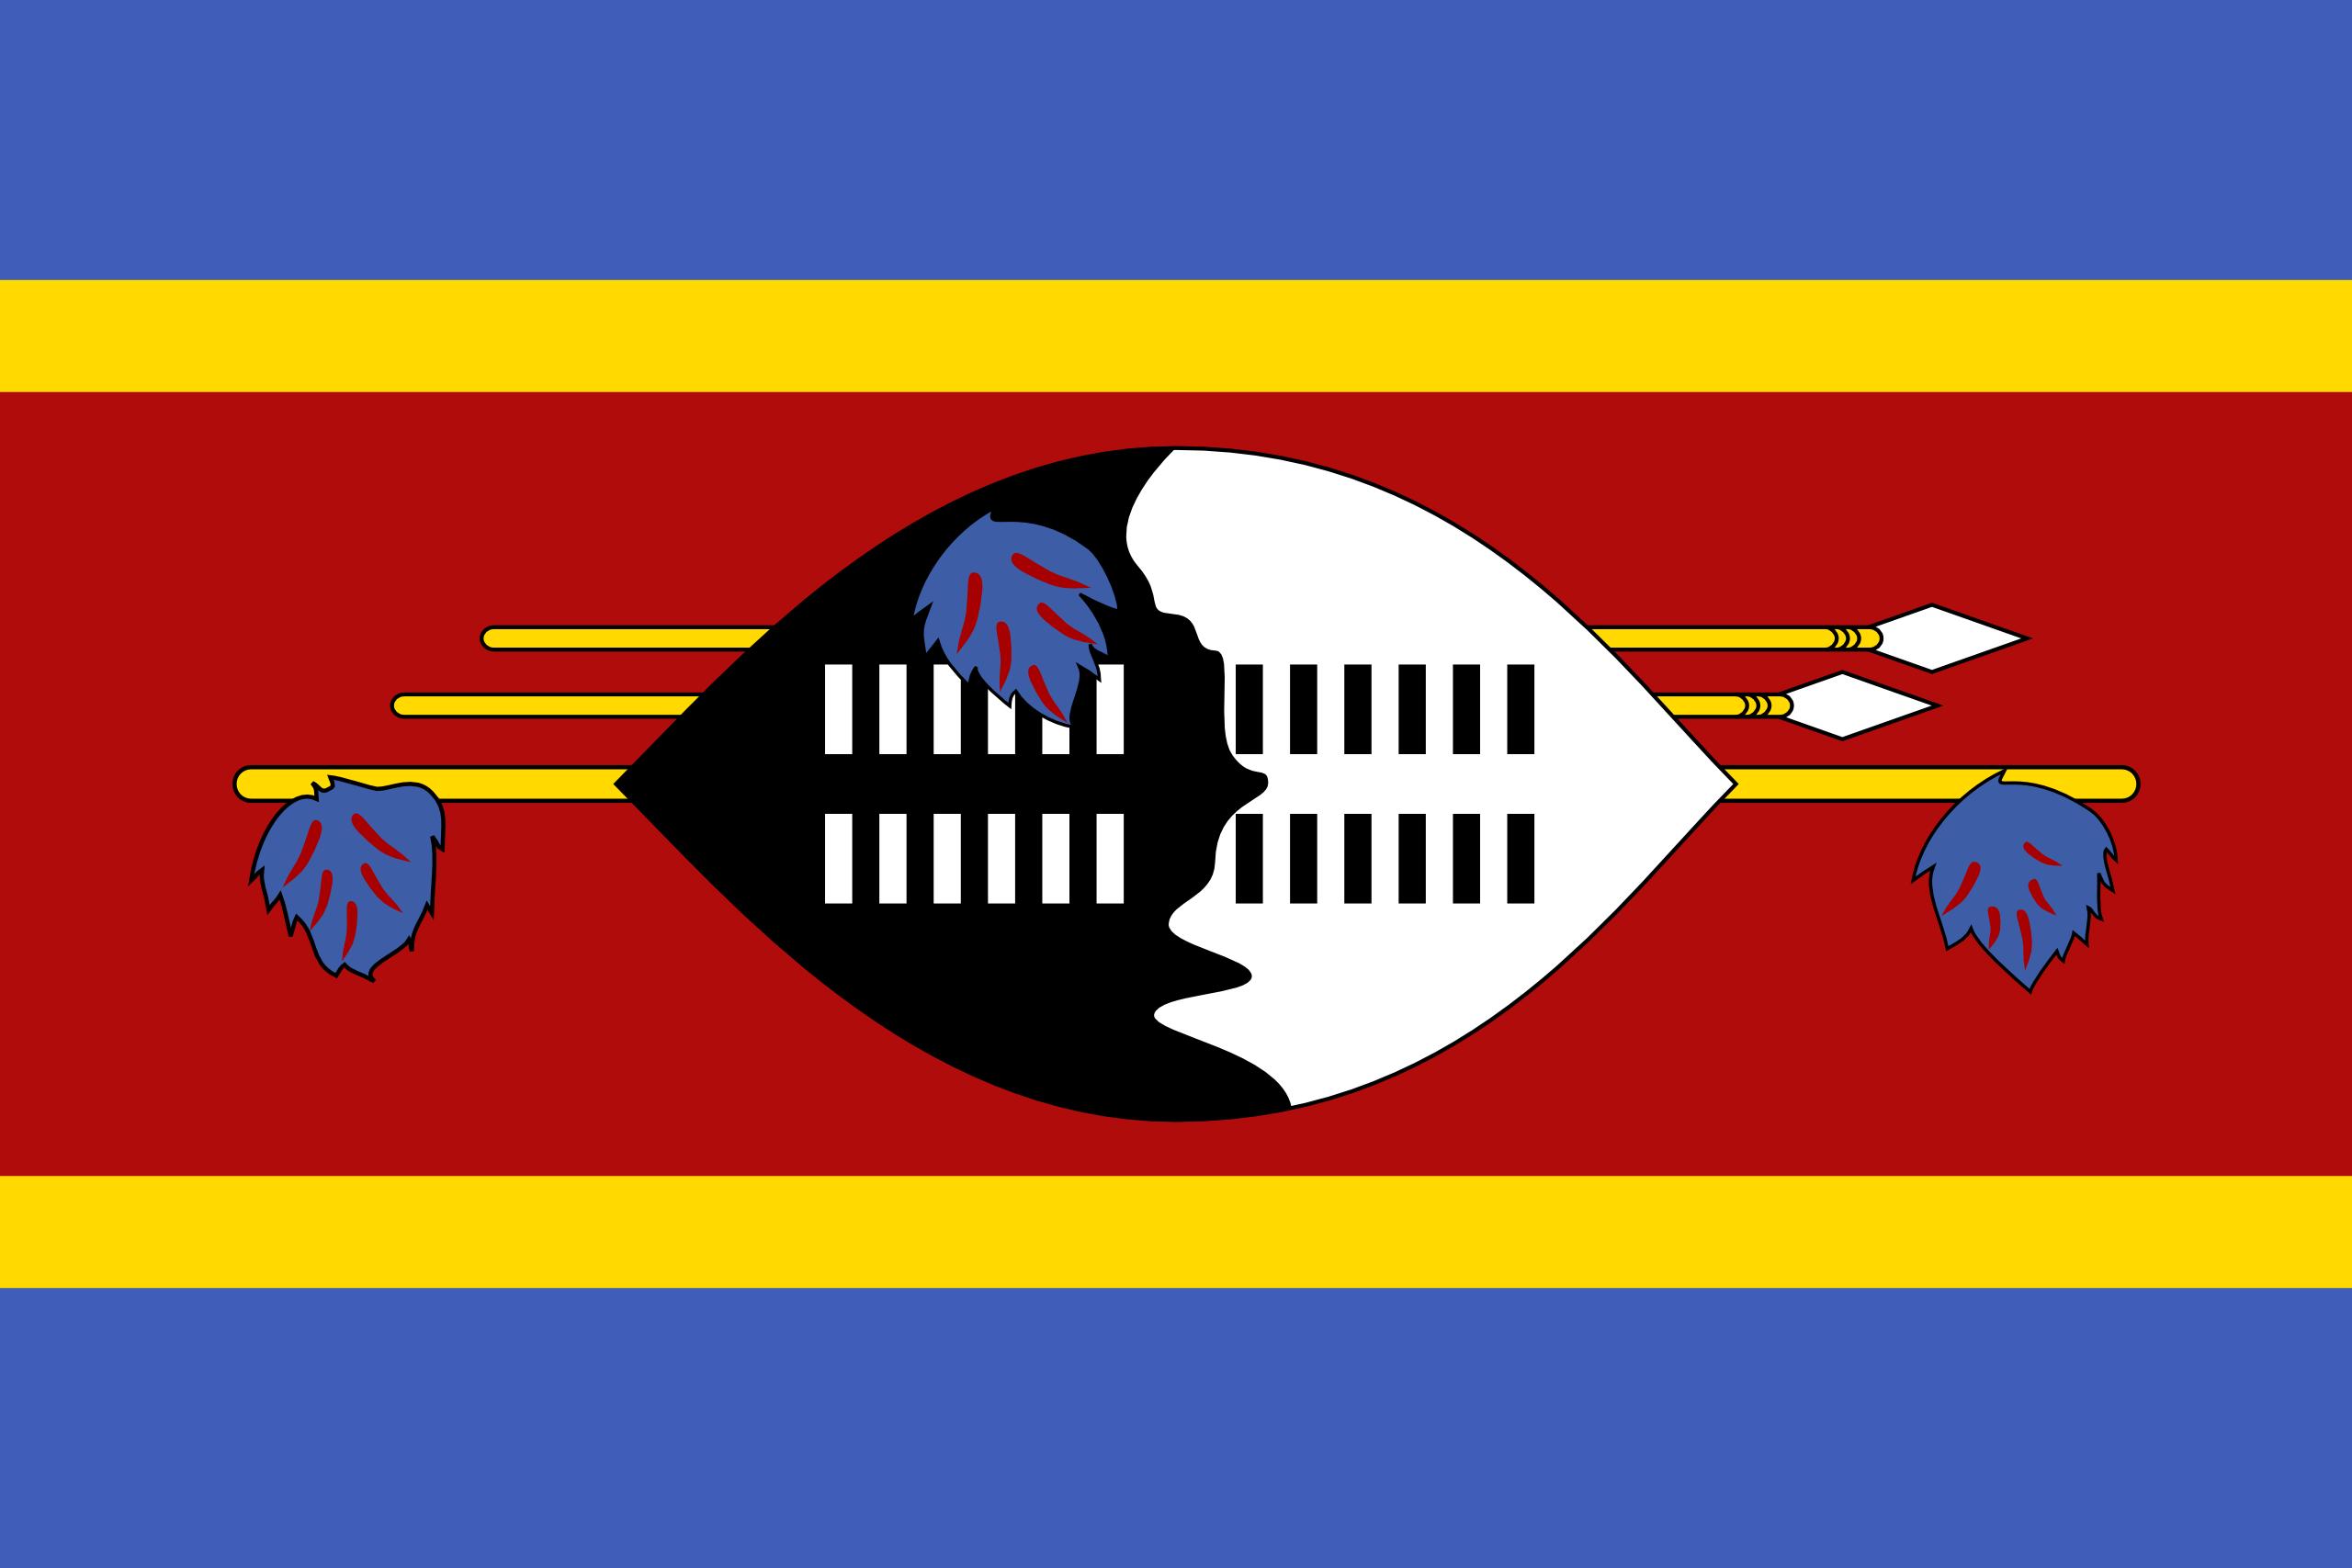 suazilandia, देश, emblema, लोग�प्रतीकbolo - HD वॉलपेपर - प्रोफेसर-falken.com